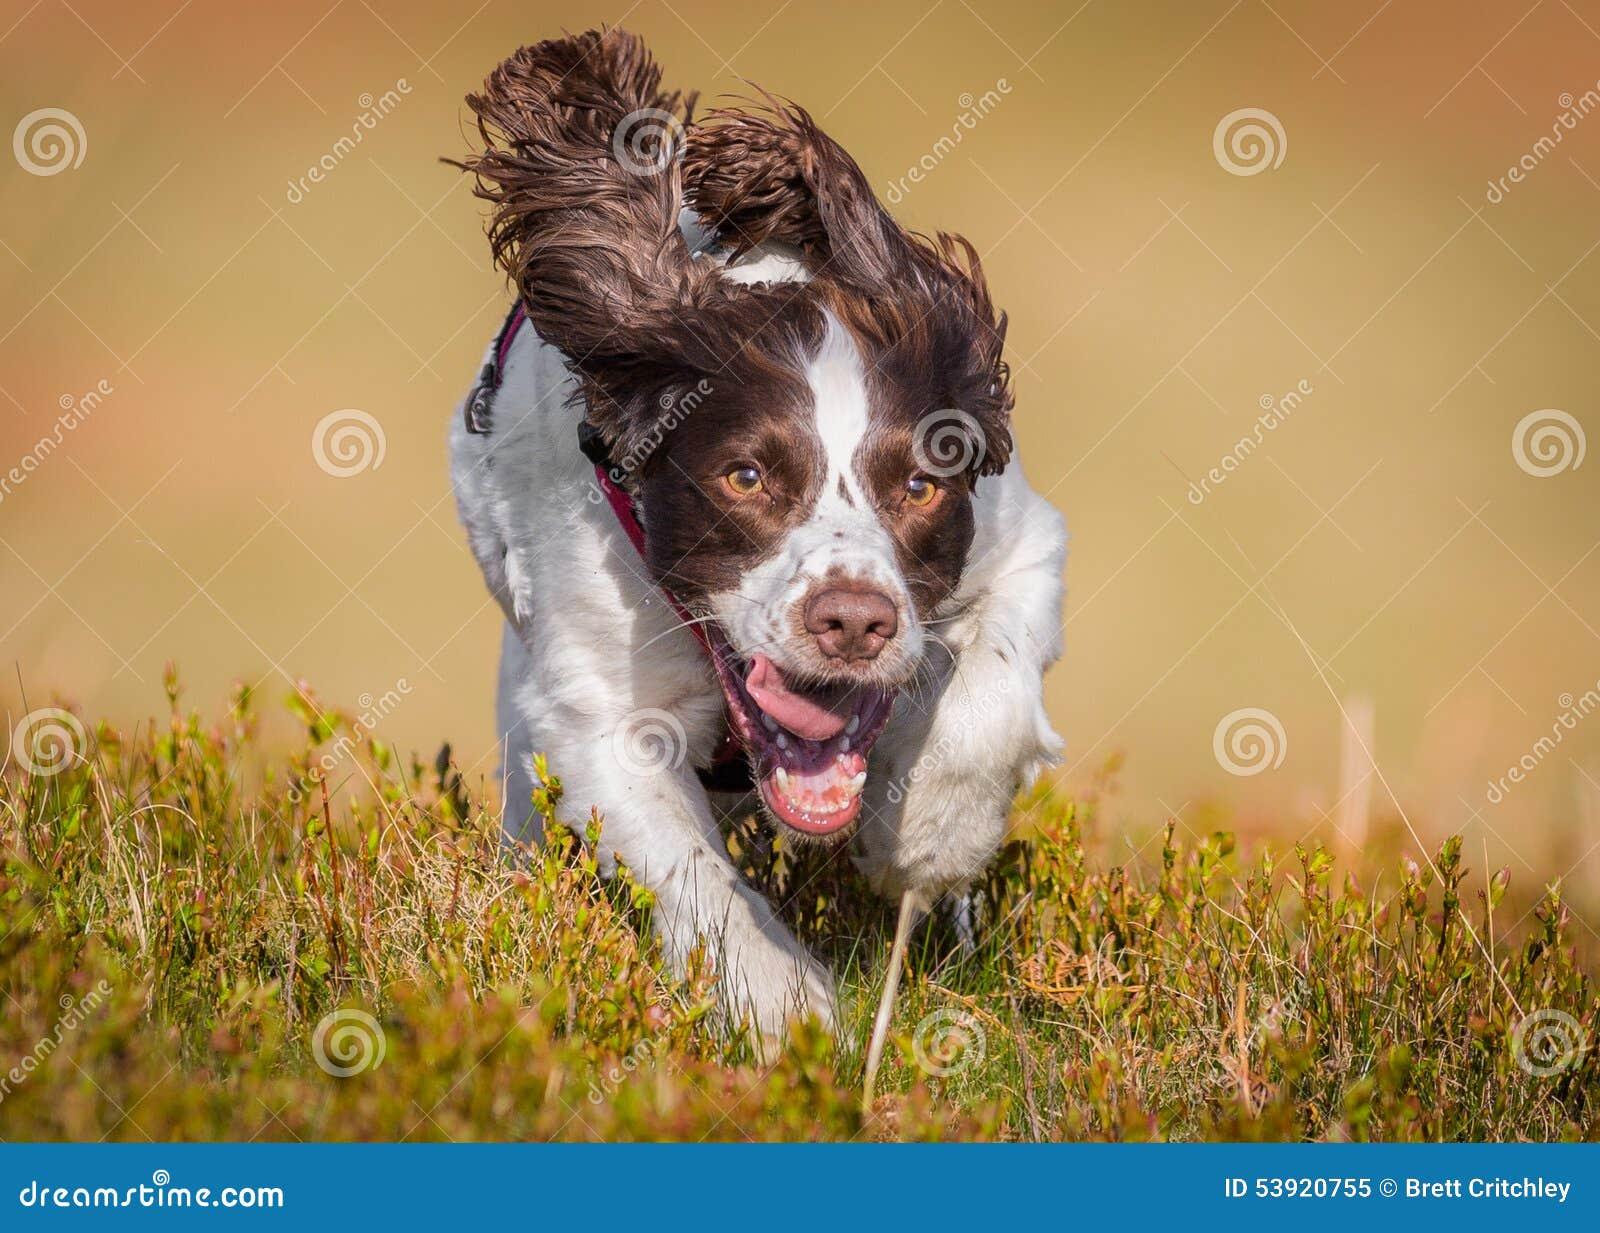 Working gun dog